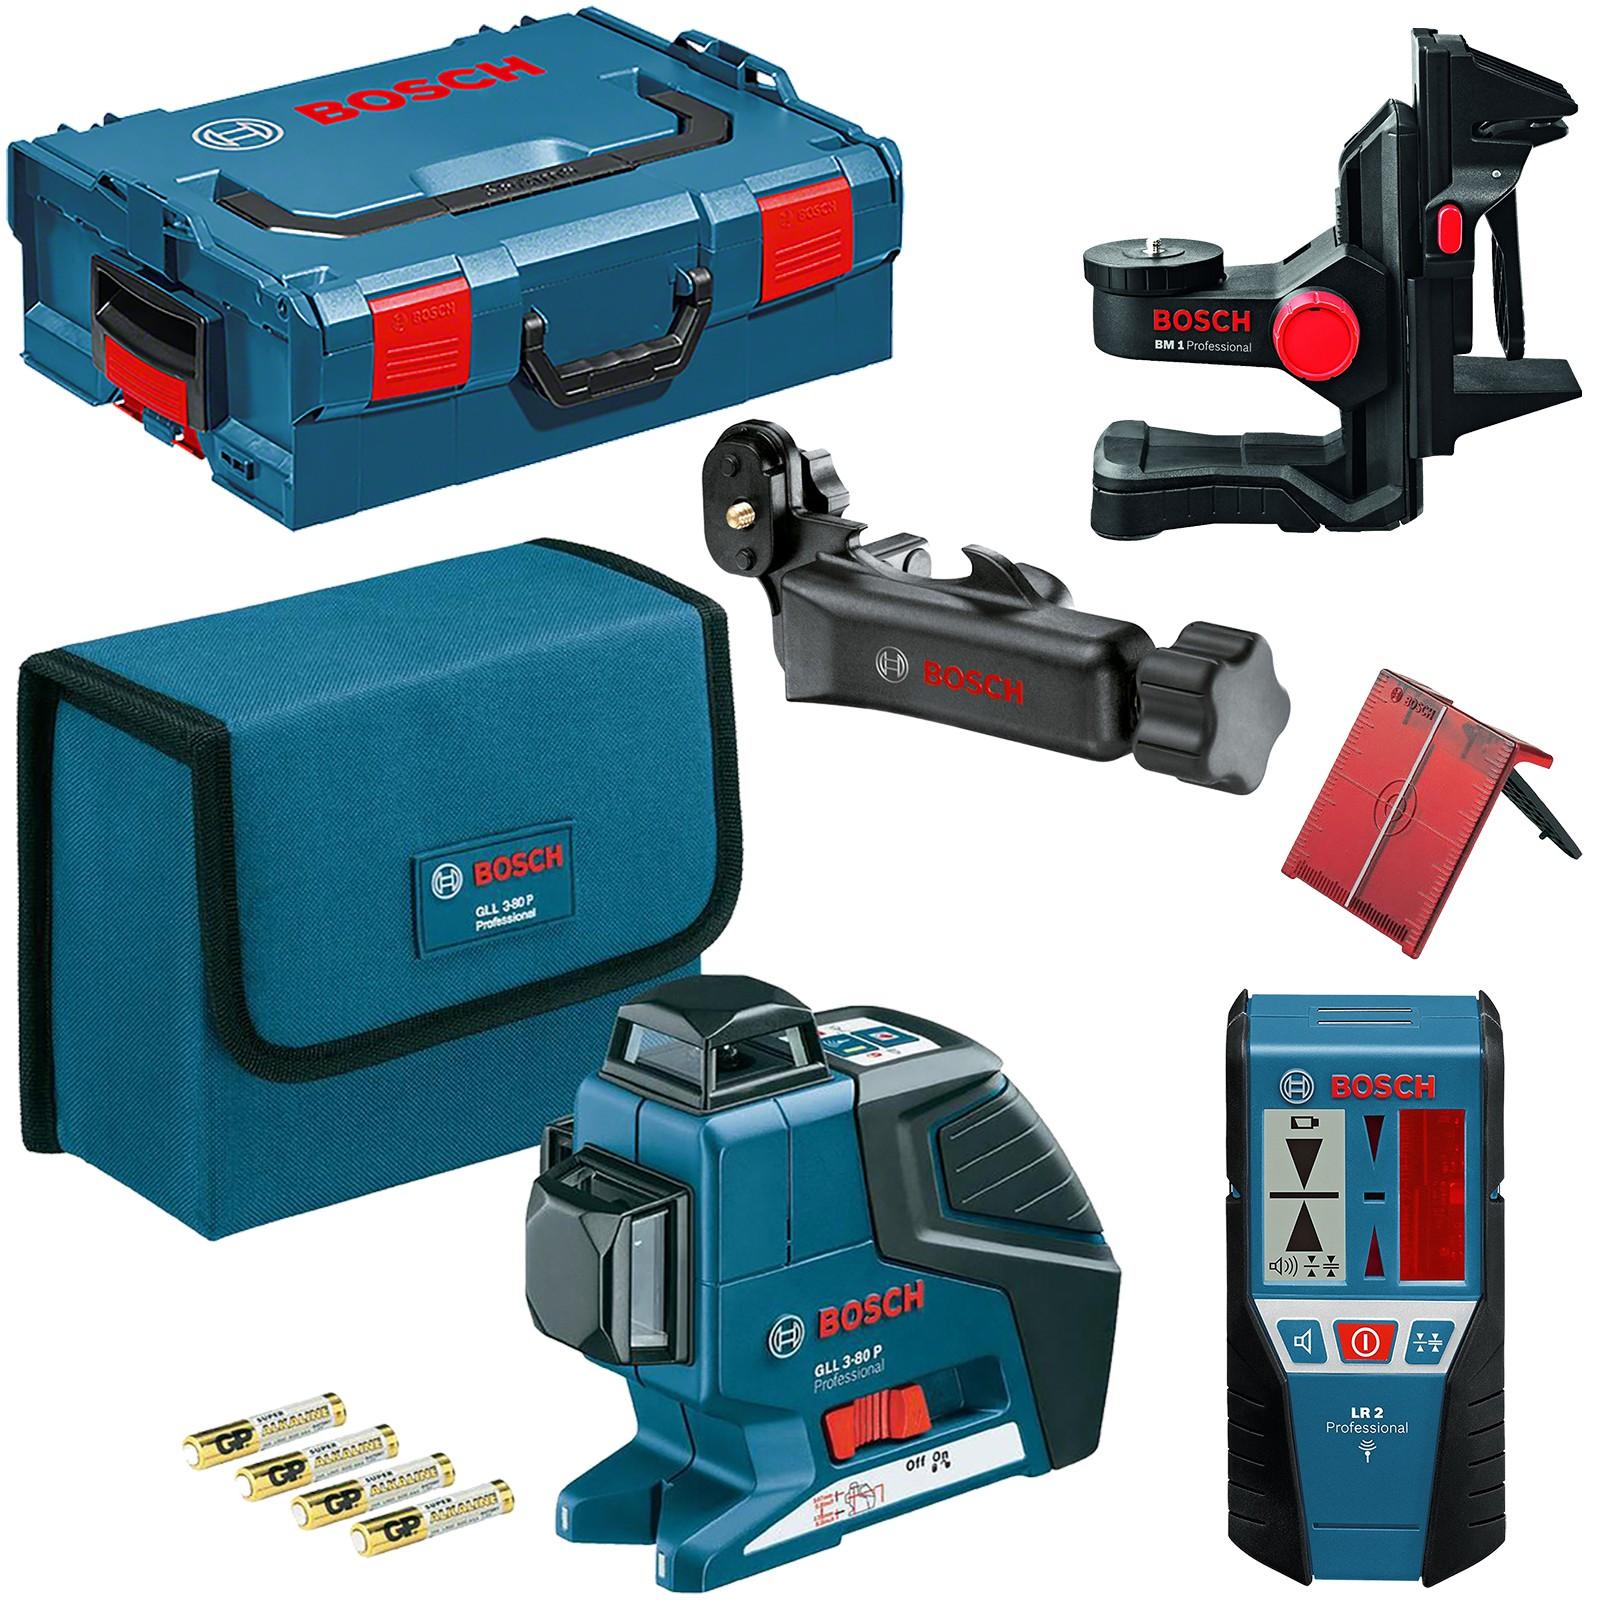 bb98da11bfdf63 Laser Bosch Professional GLL 3-80 P (0 601 063 30A) + LR 2 (0 601 ...